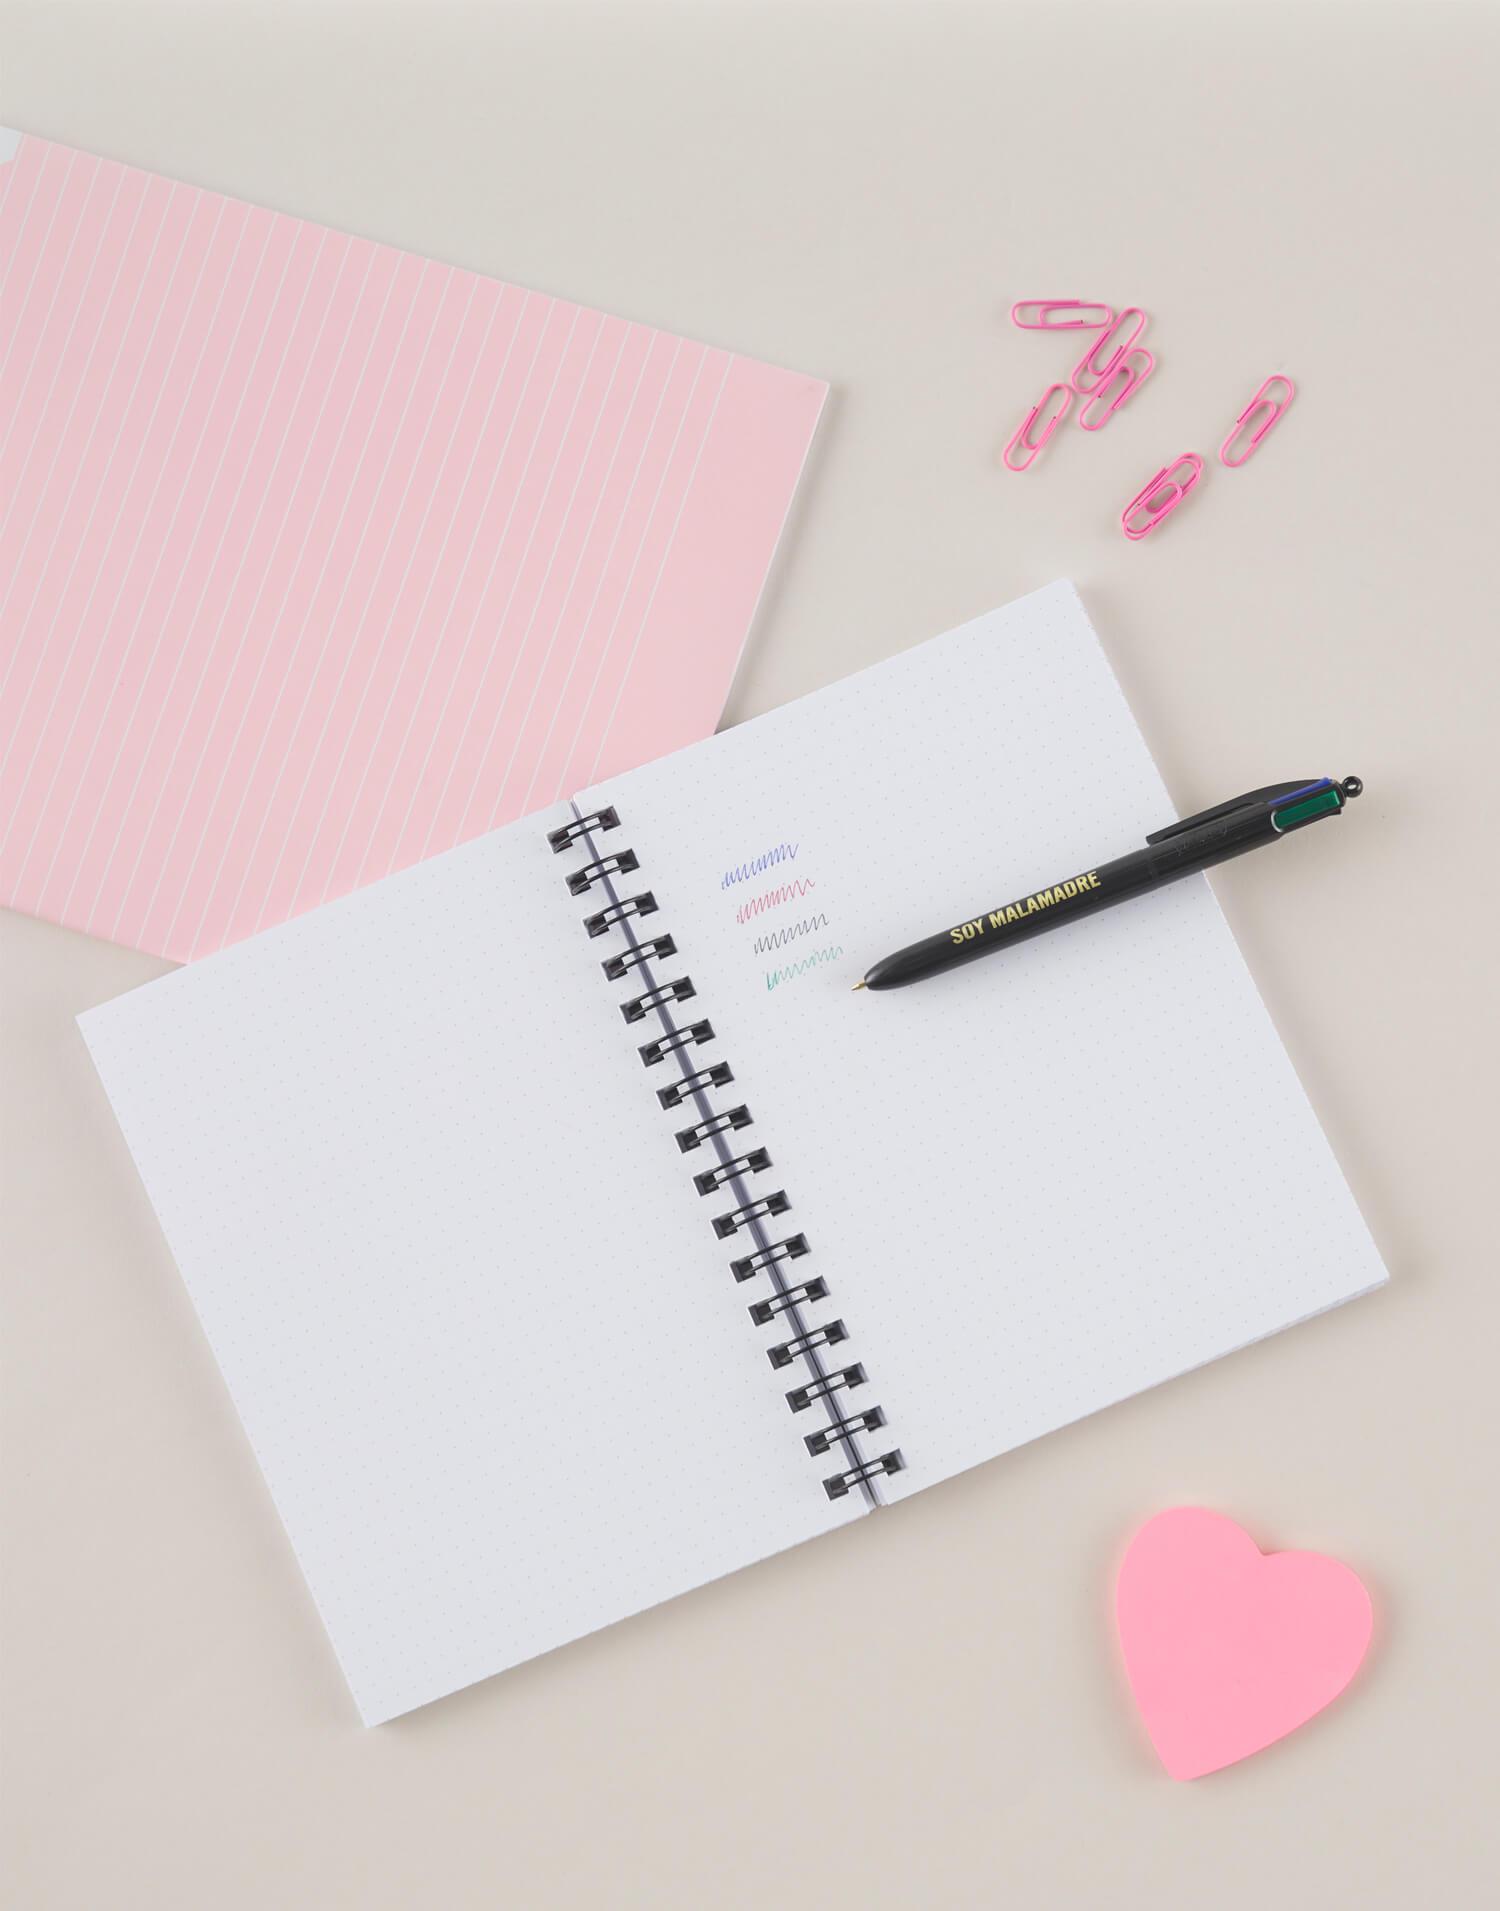 Pack de 2 bolígrafos Soy Malamadre